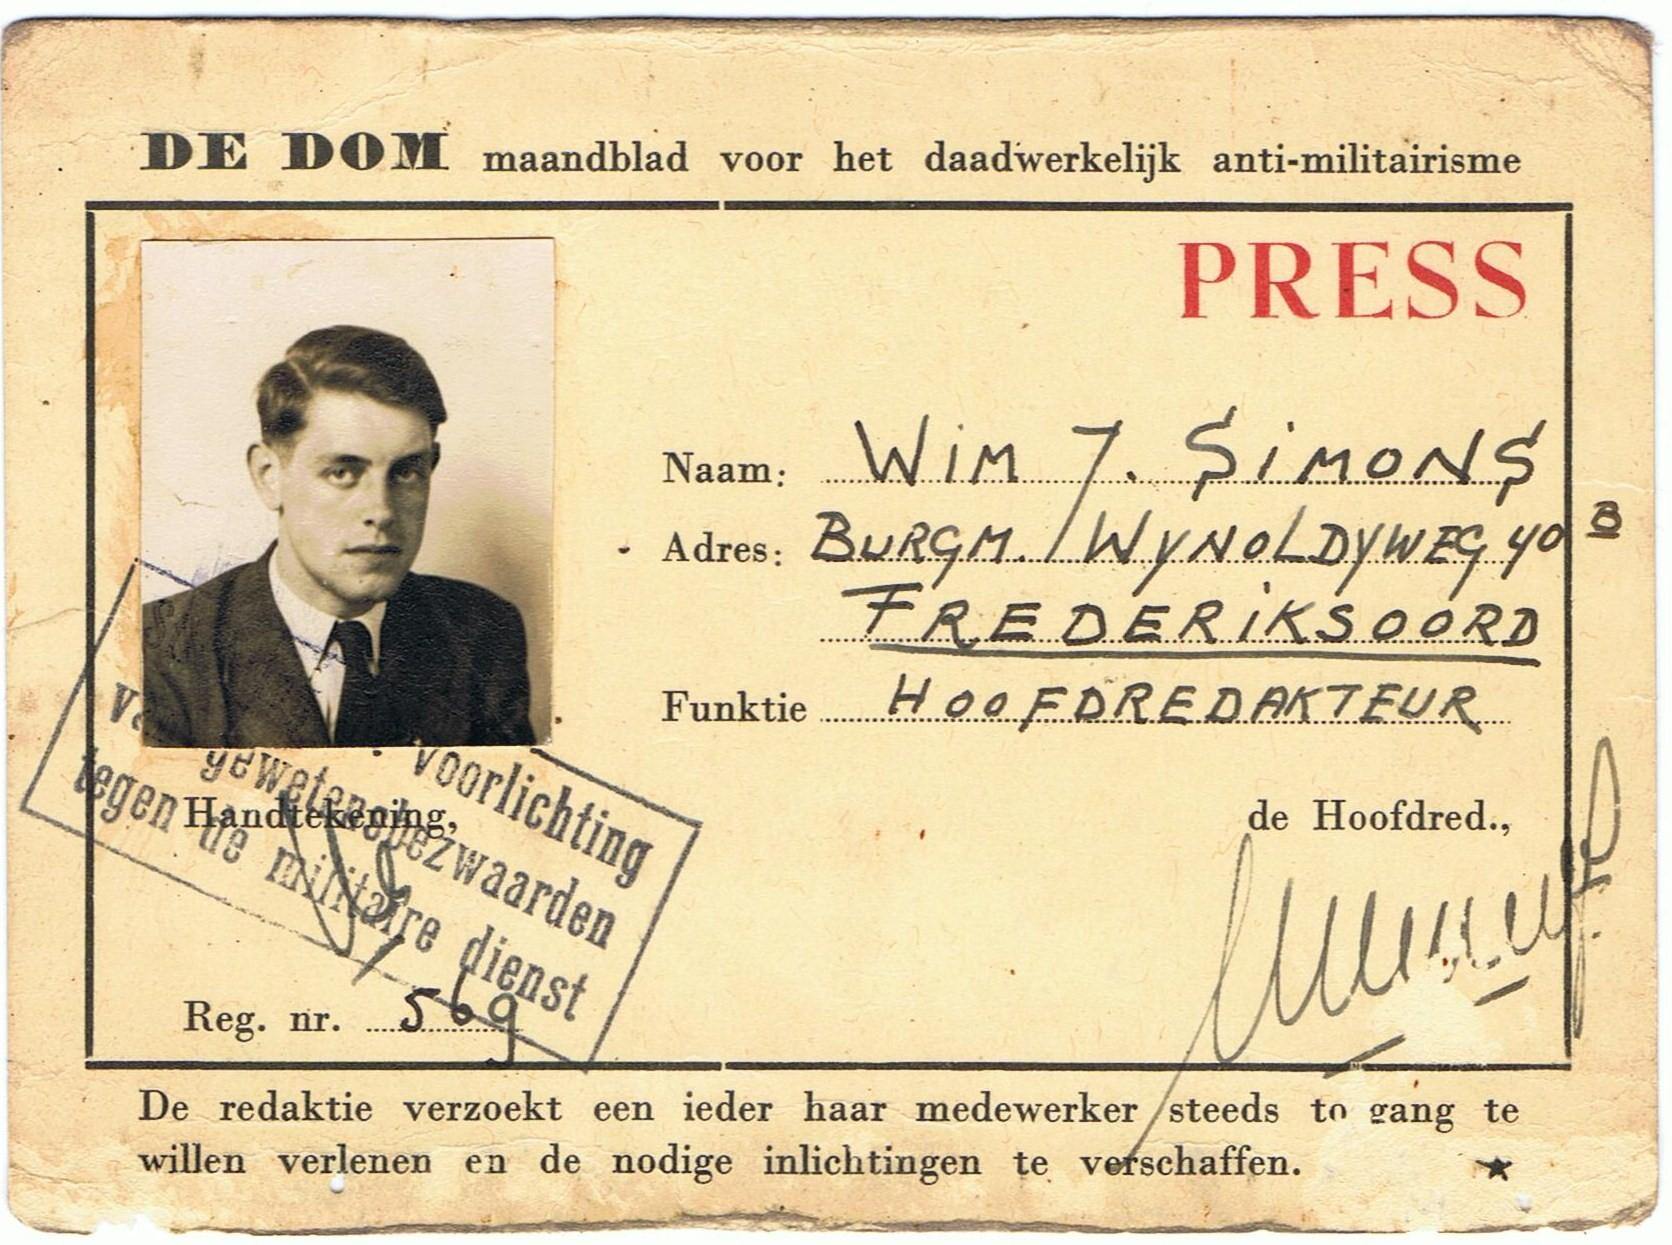 Perskaart Wim Simons